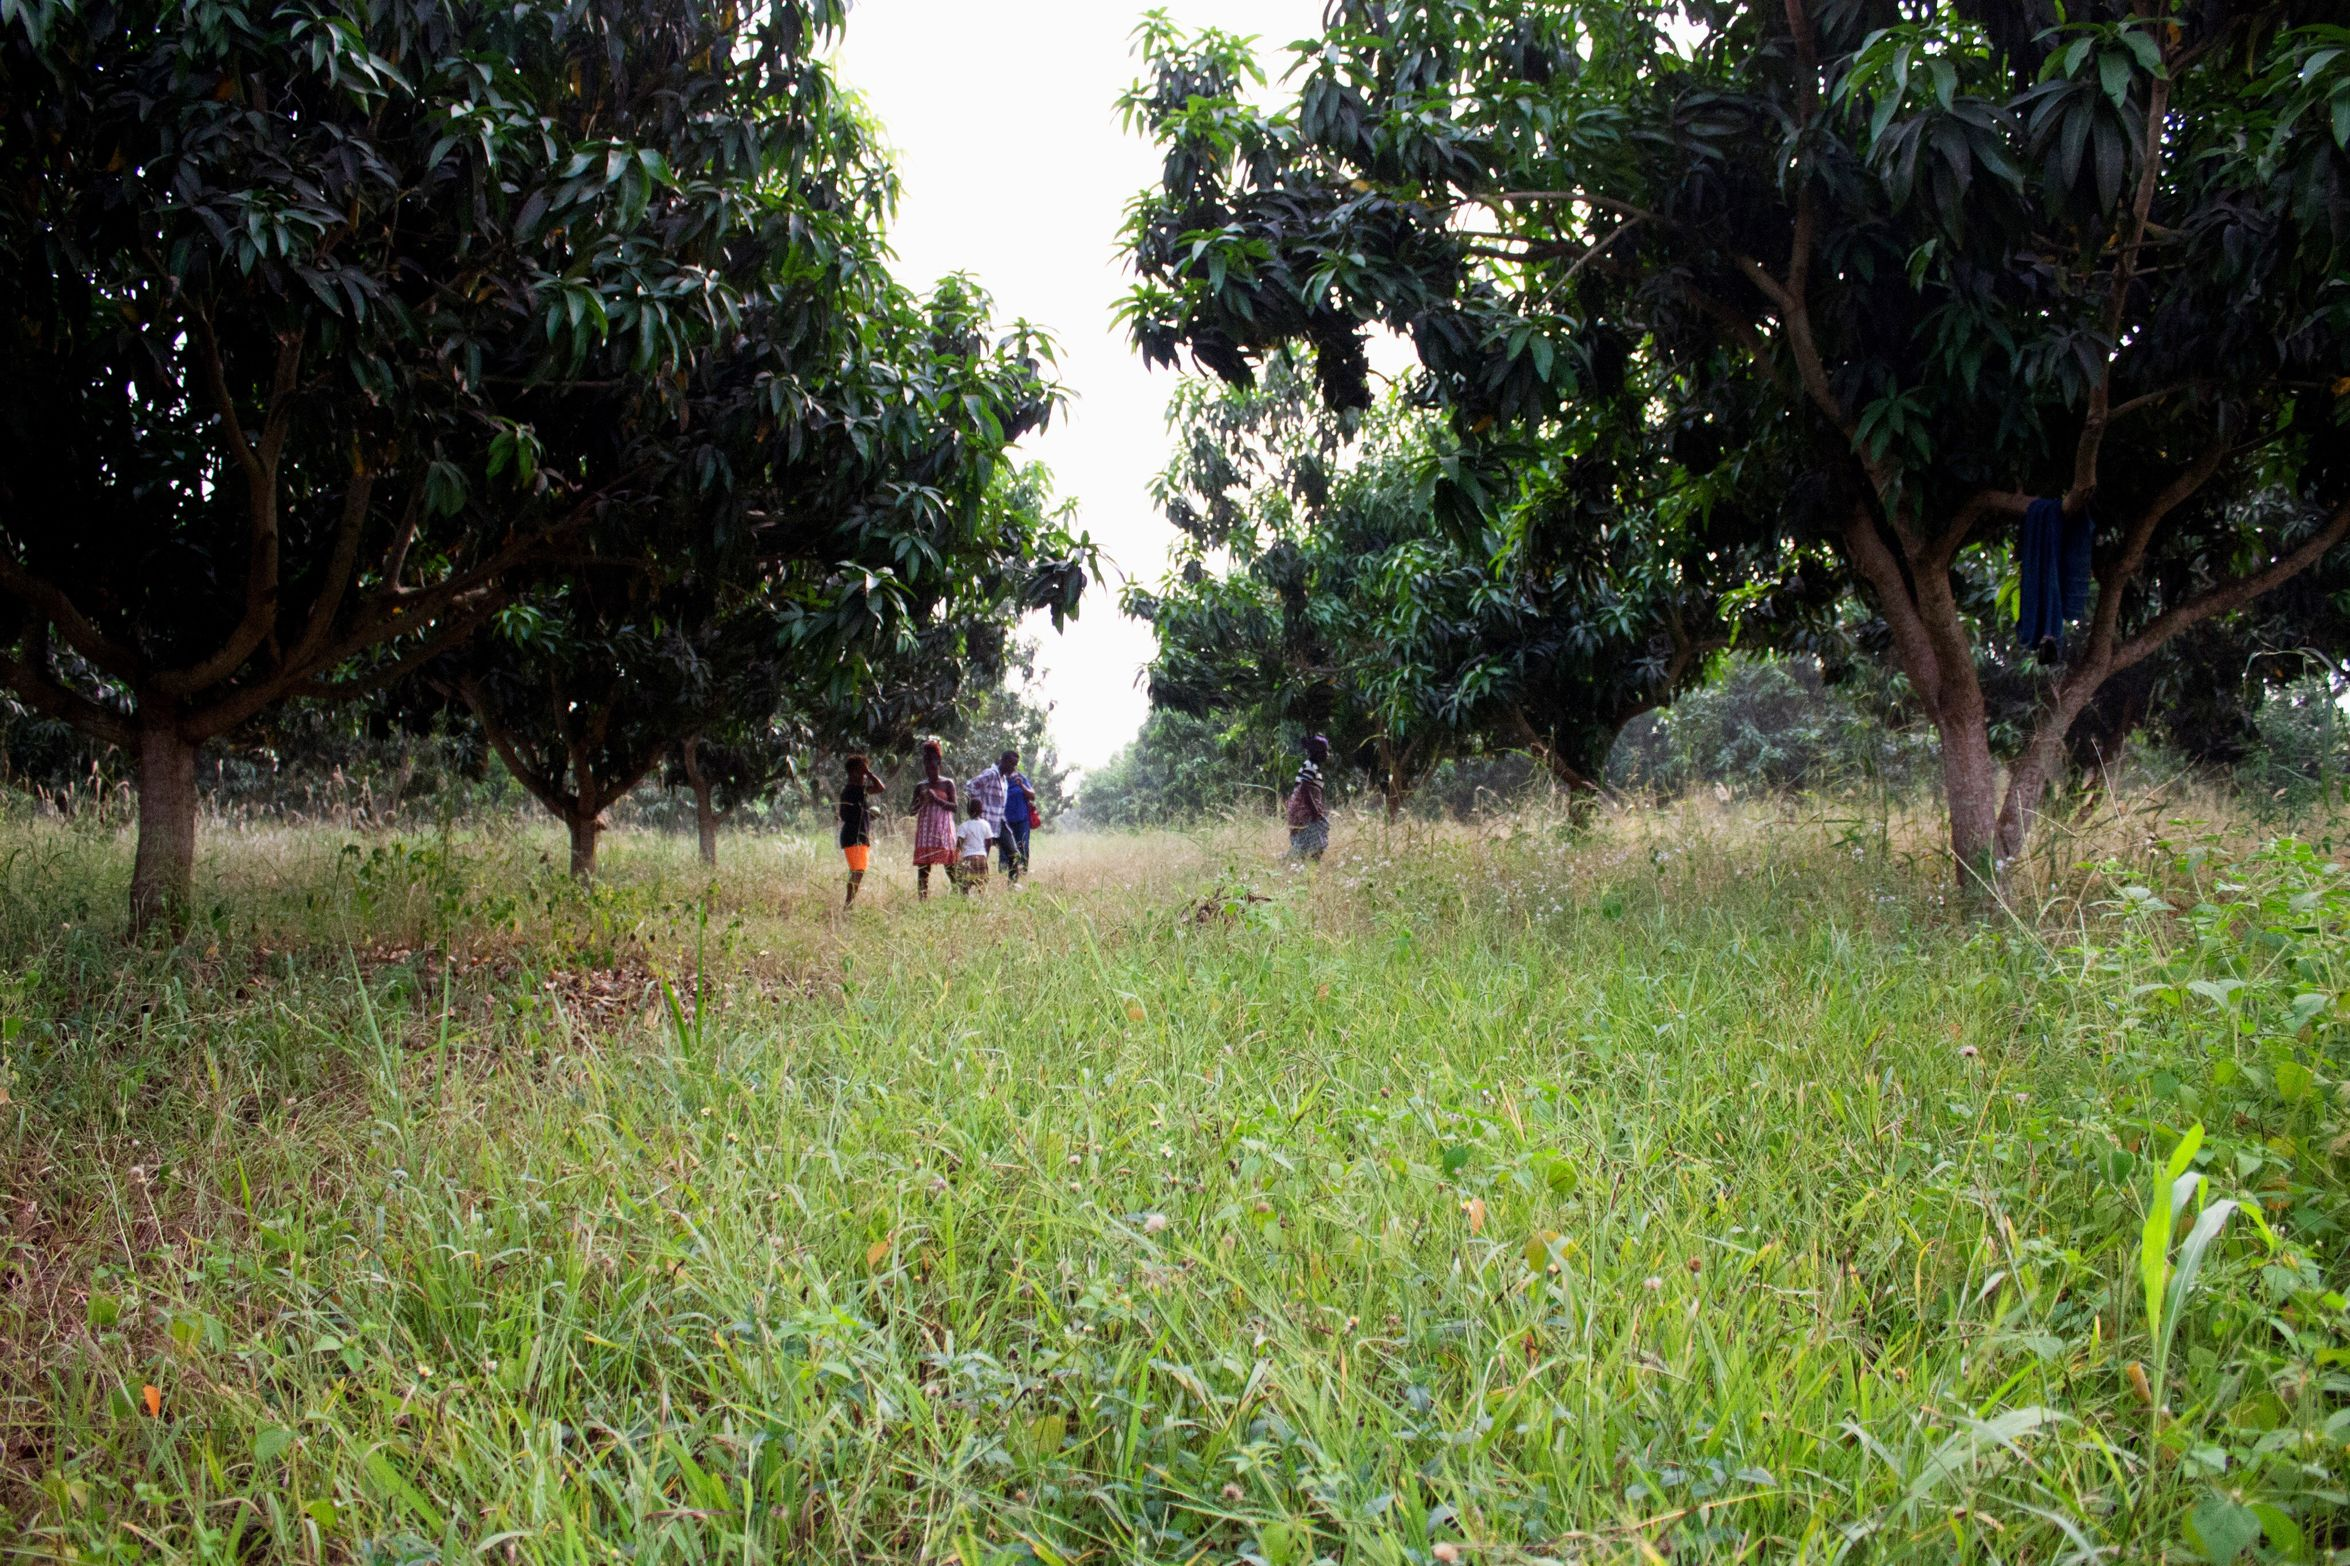 Grandmas Mangofarm Mango Mangos Farm Mangofarm Ghana In Love With IT Sogakofe Grandma Grandmother Future ♥